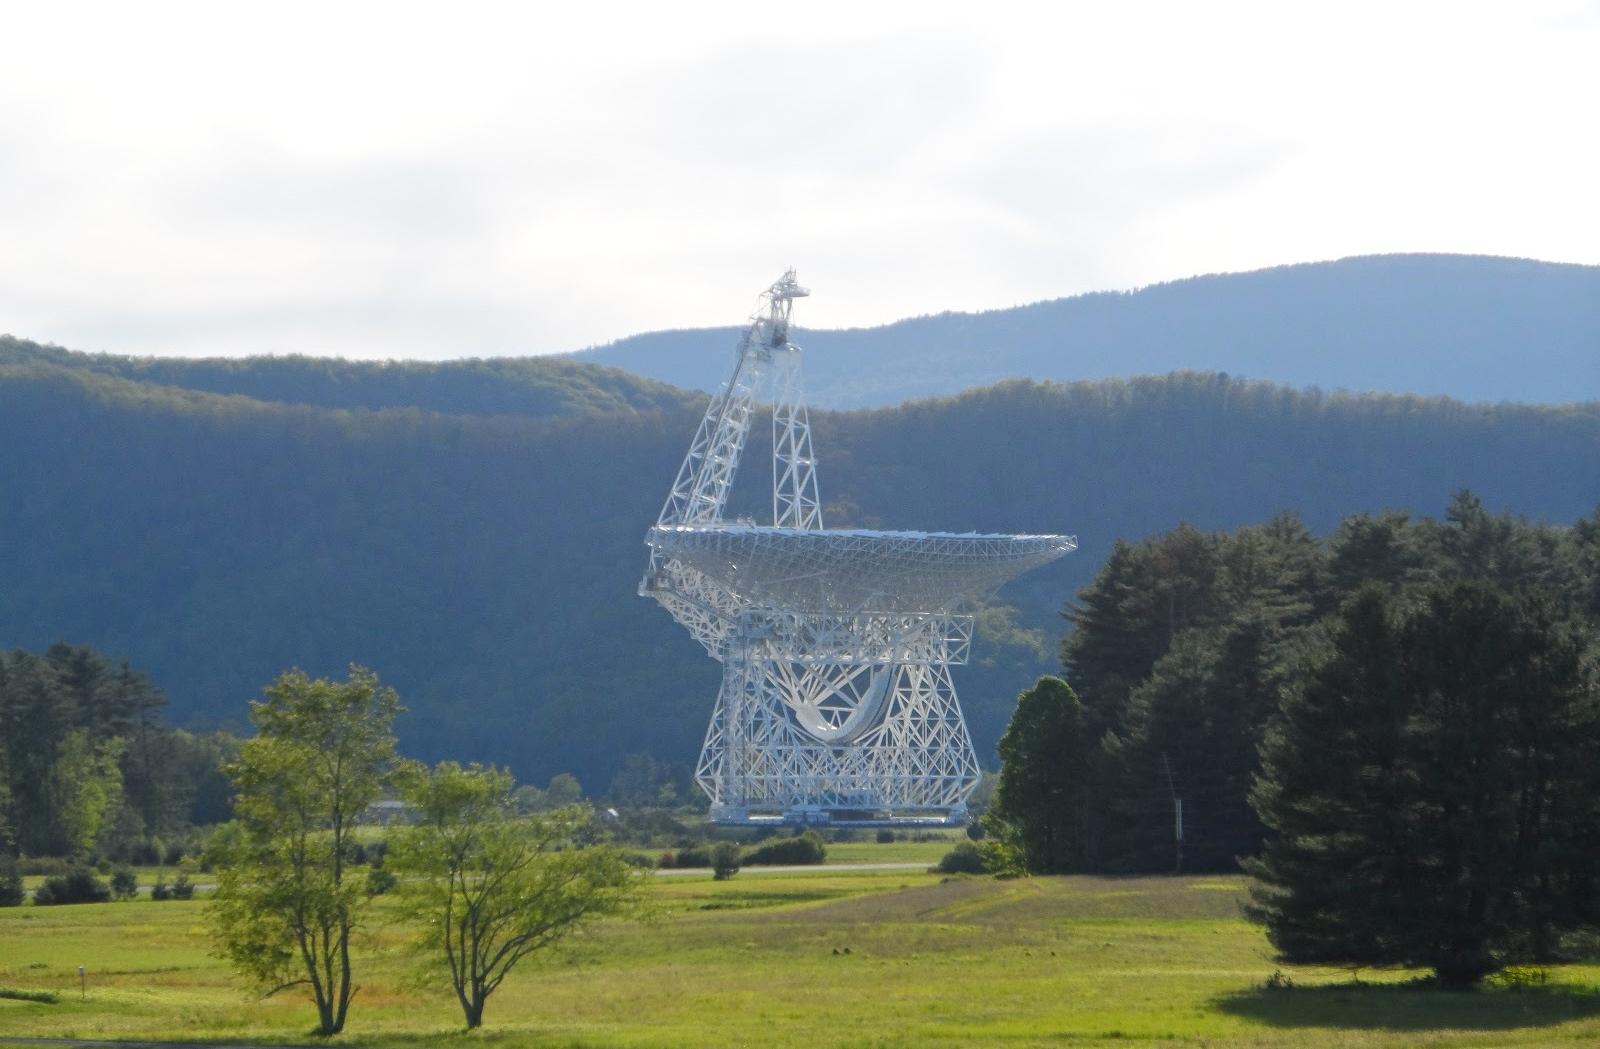 green bank radiotelescope